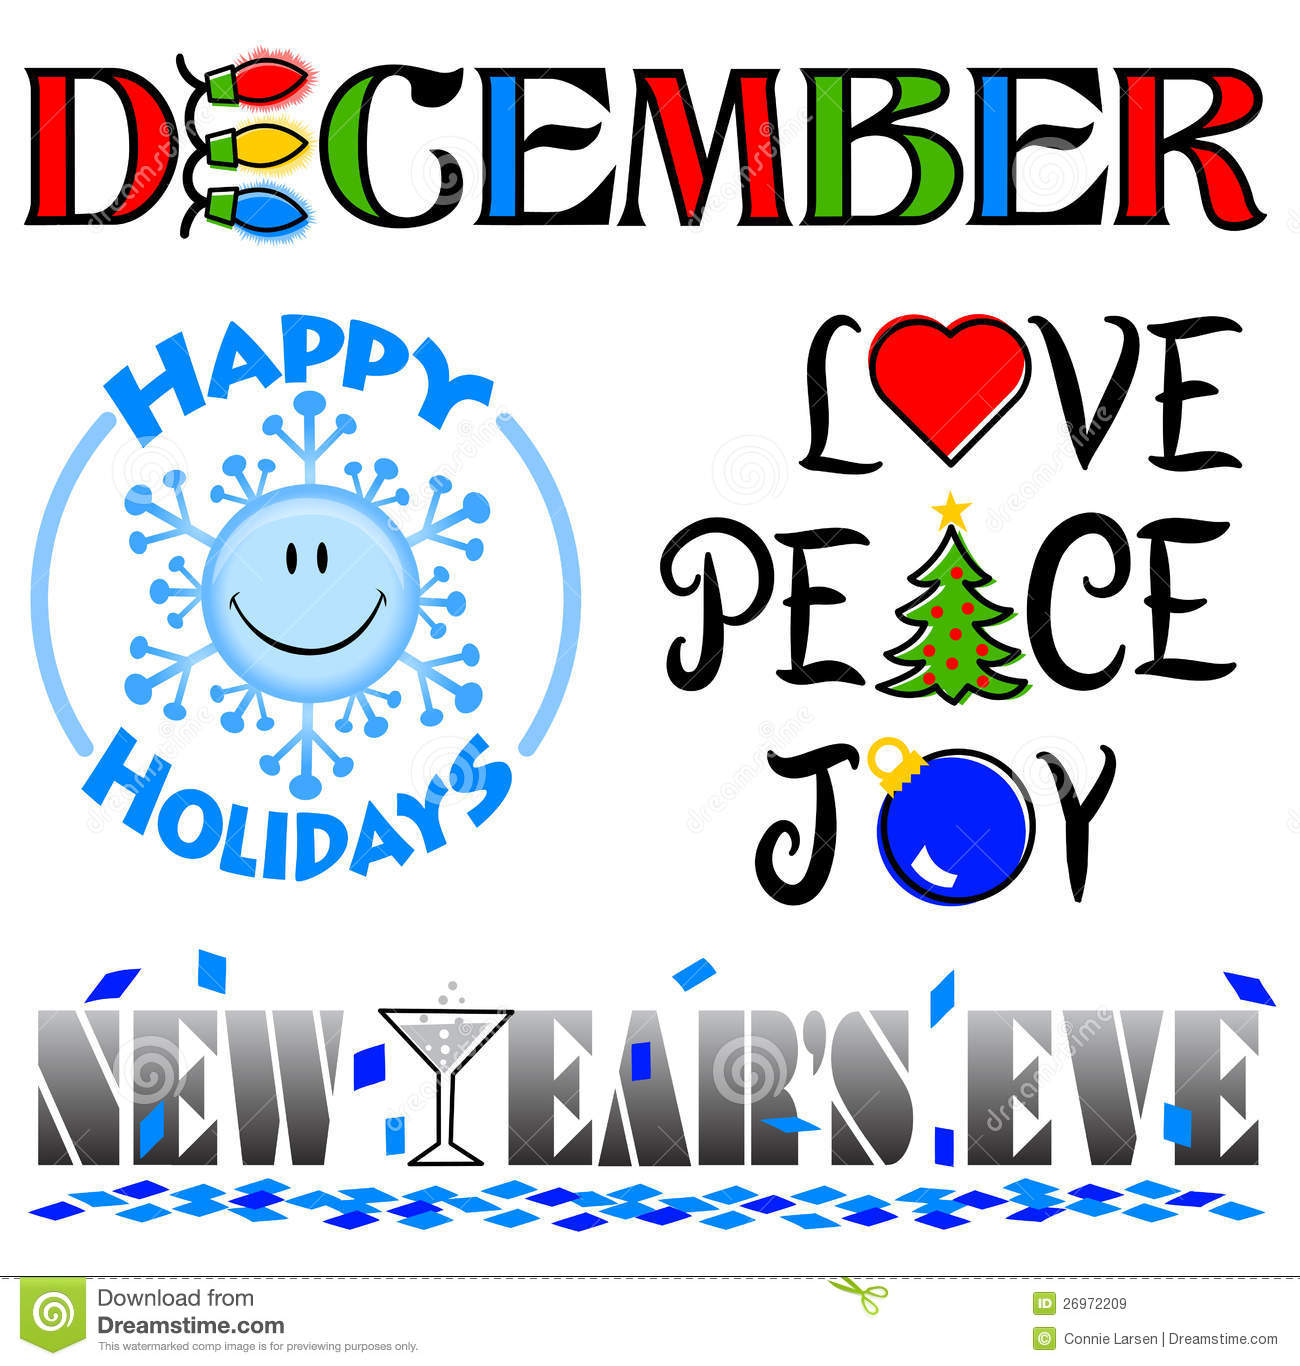 December word art